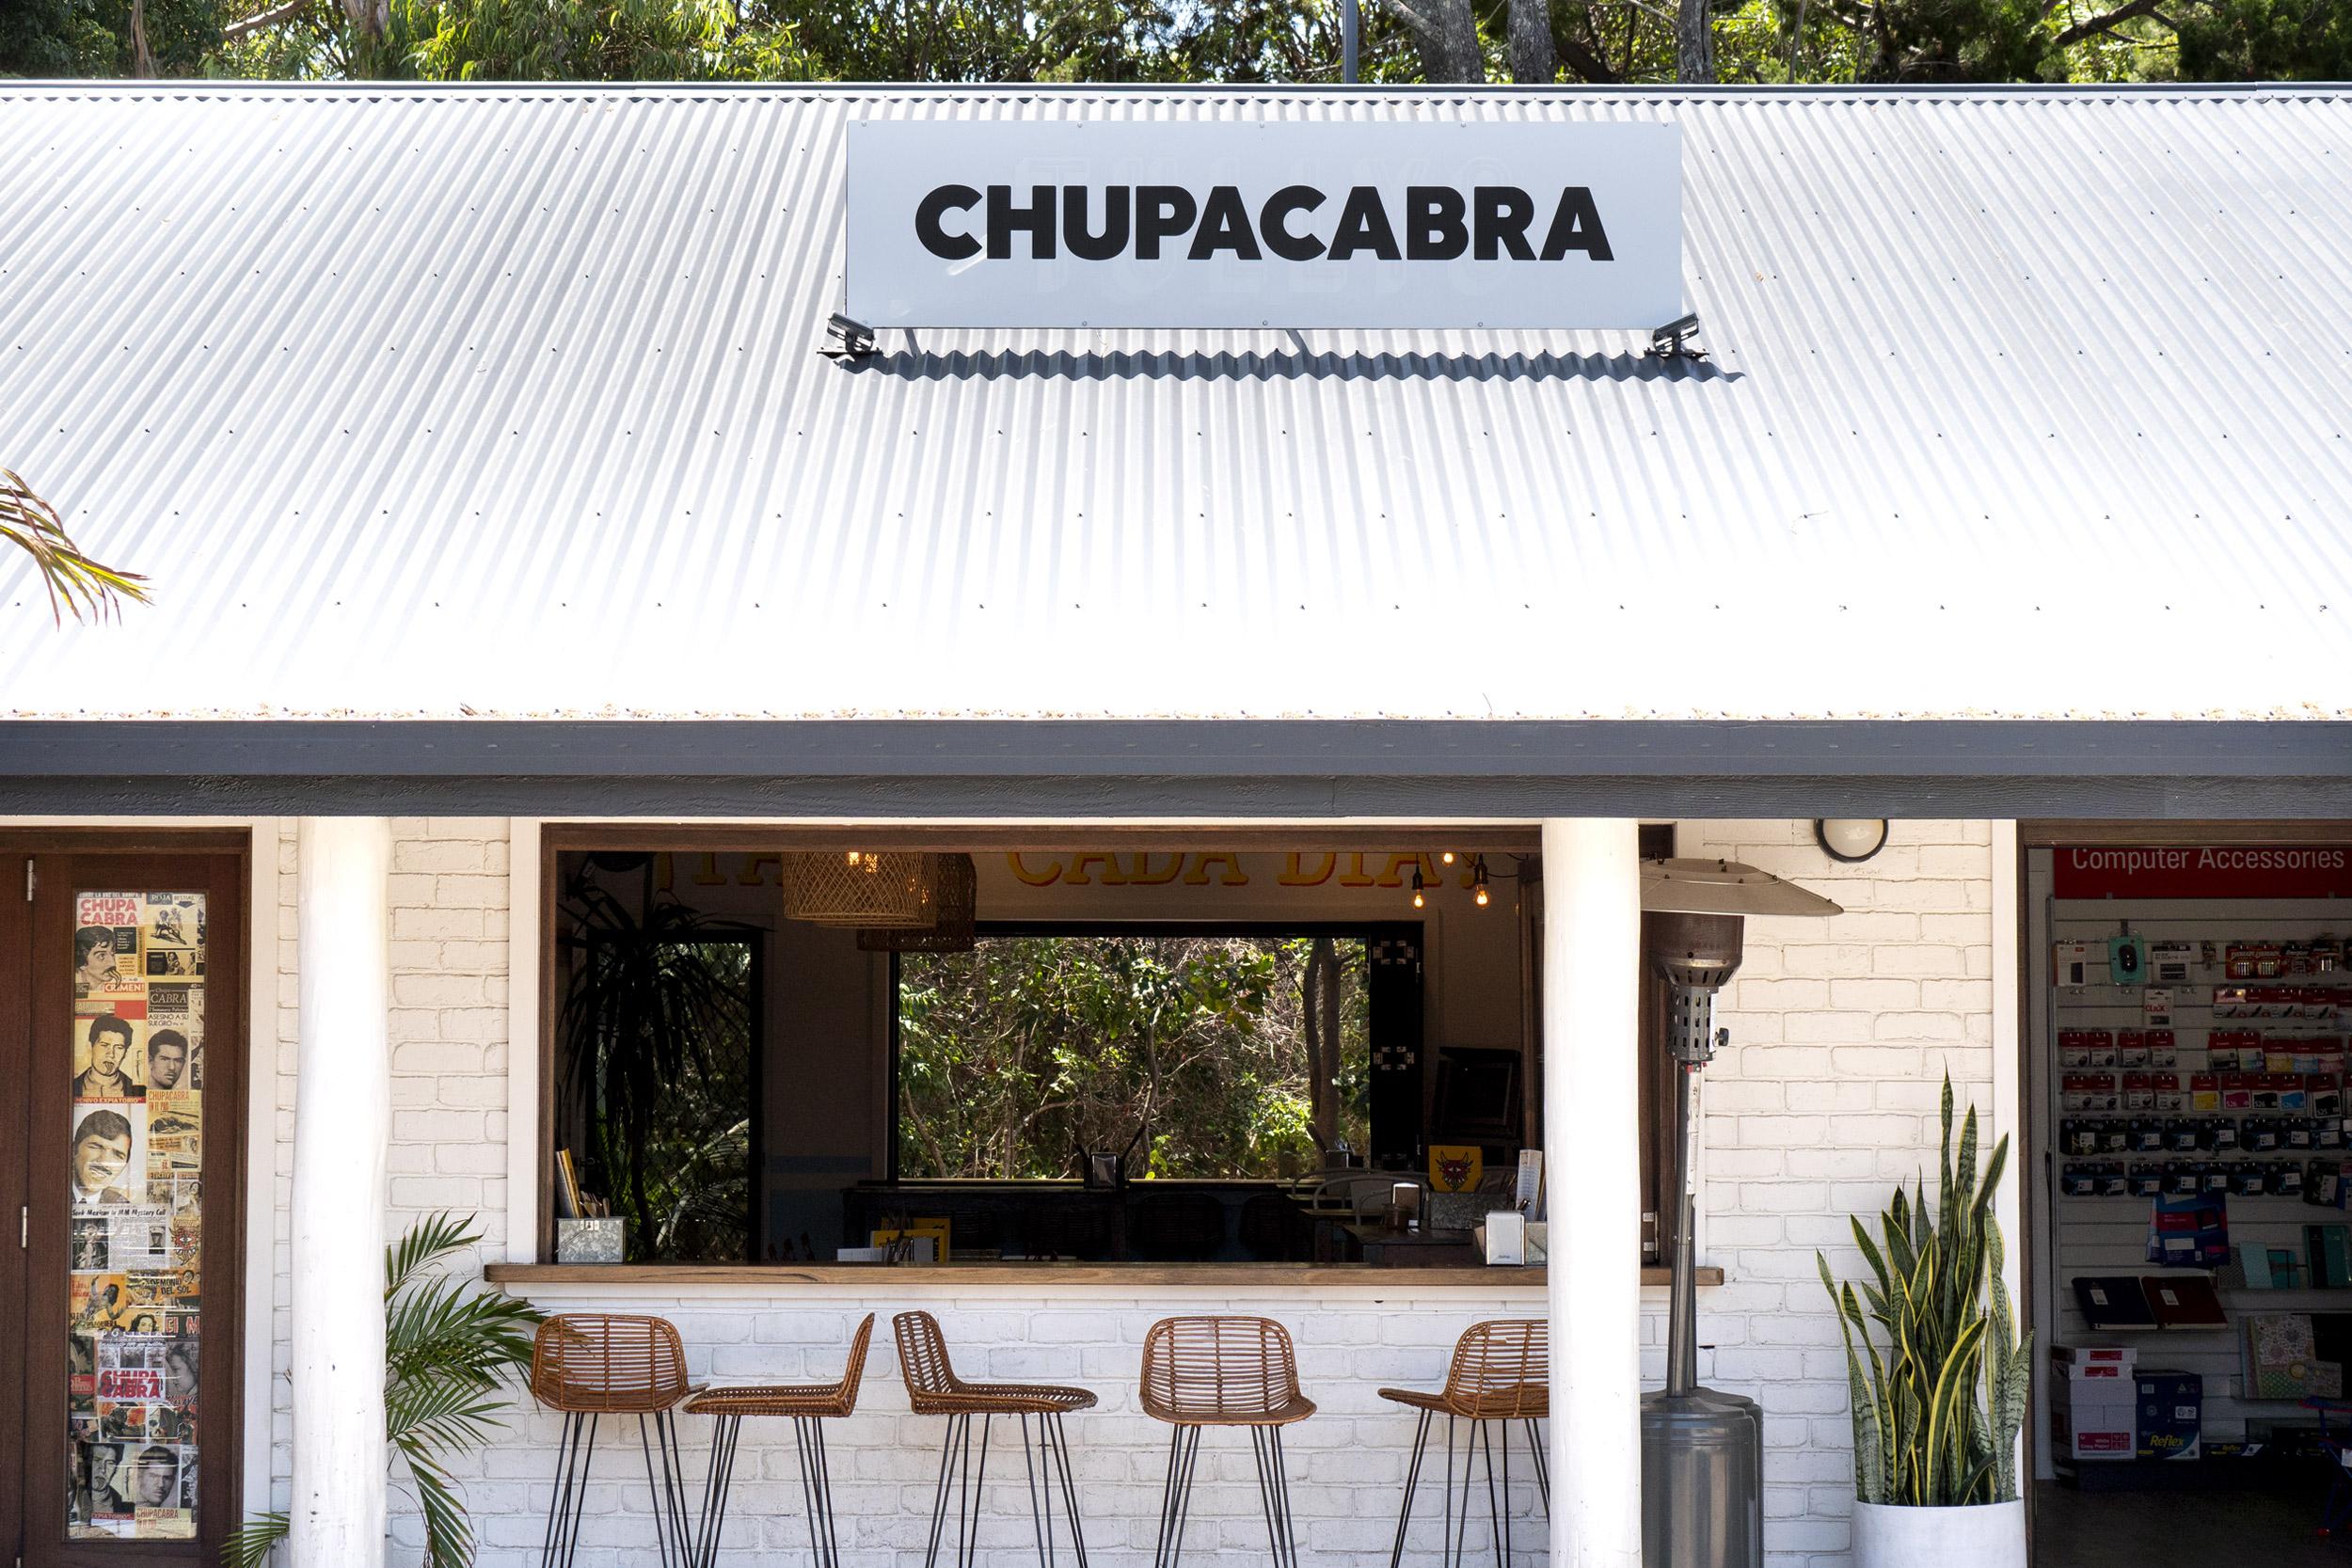 Chupacabra25.jpg